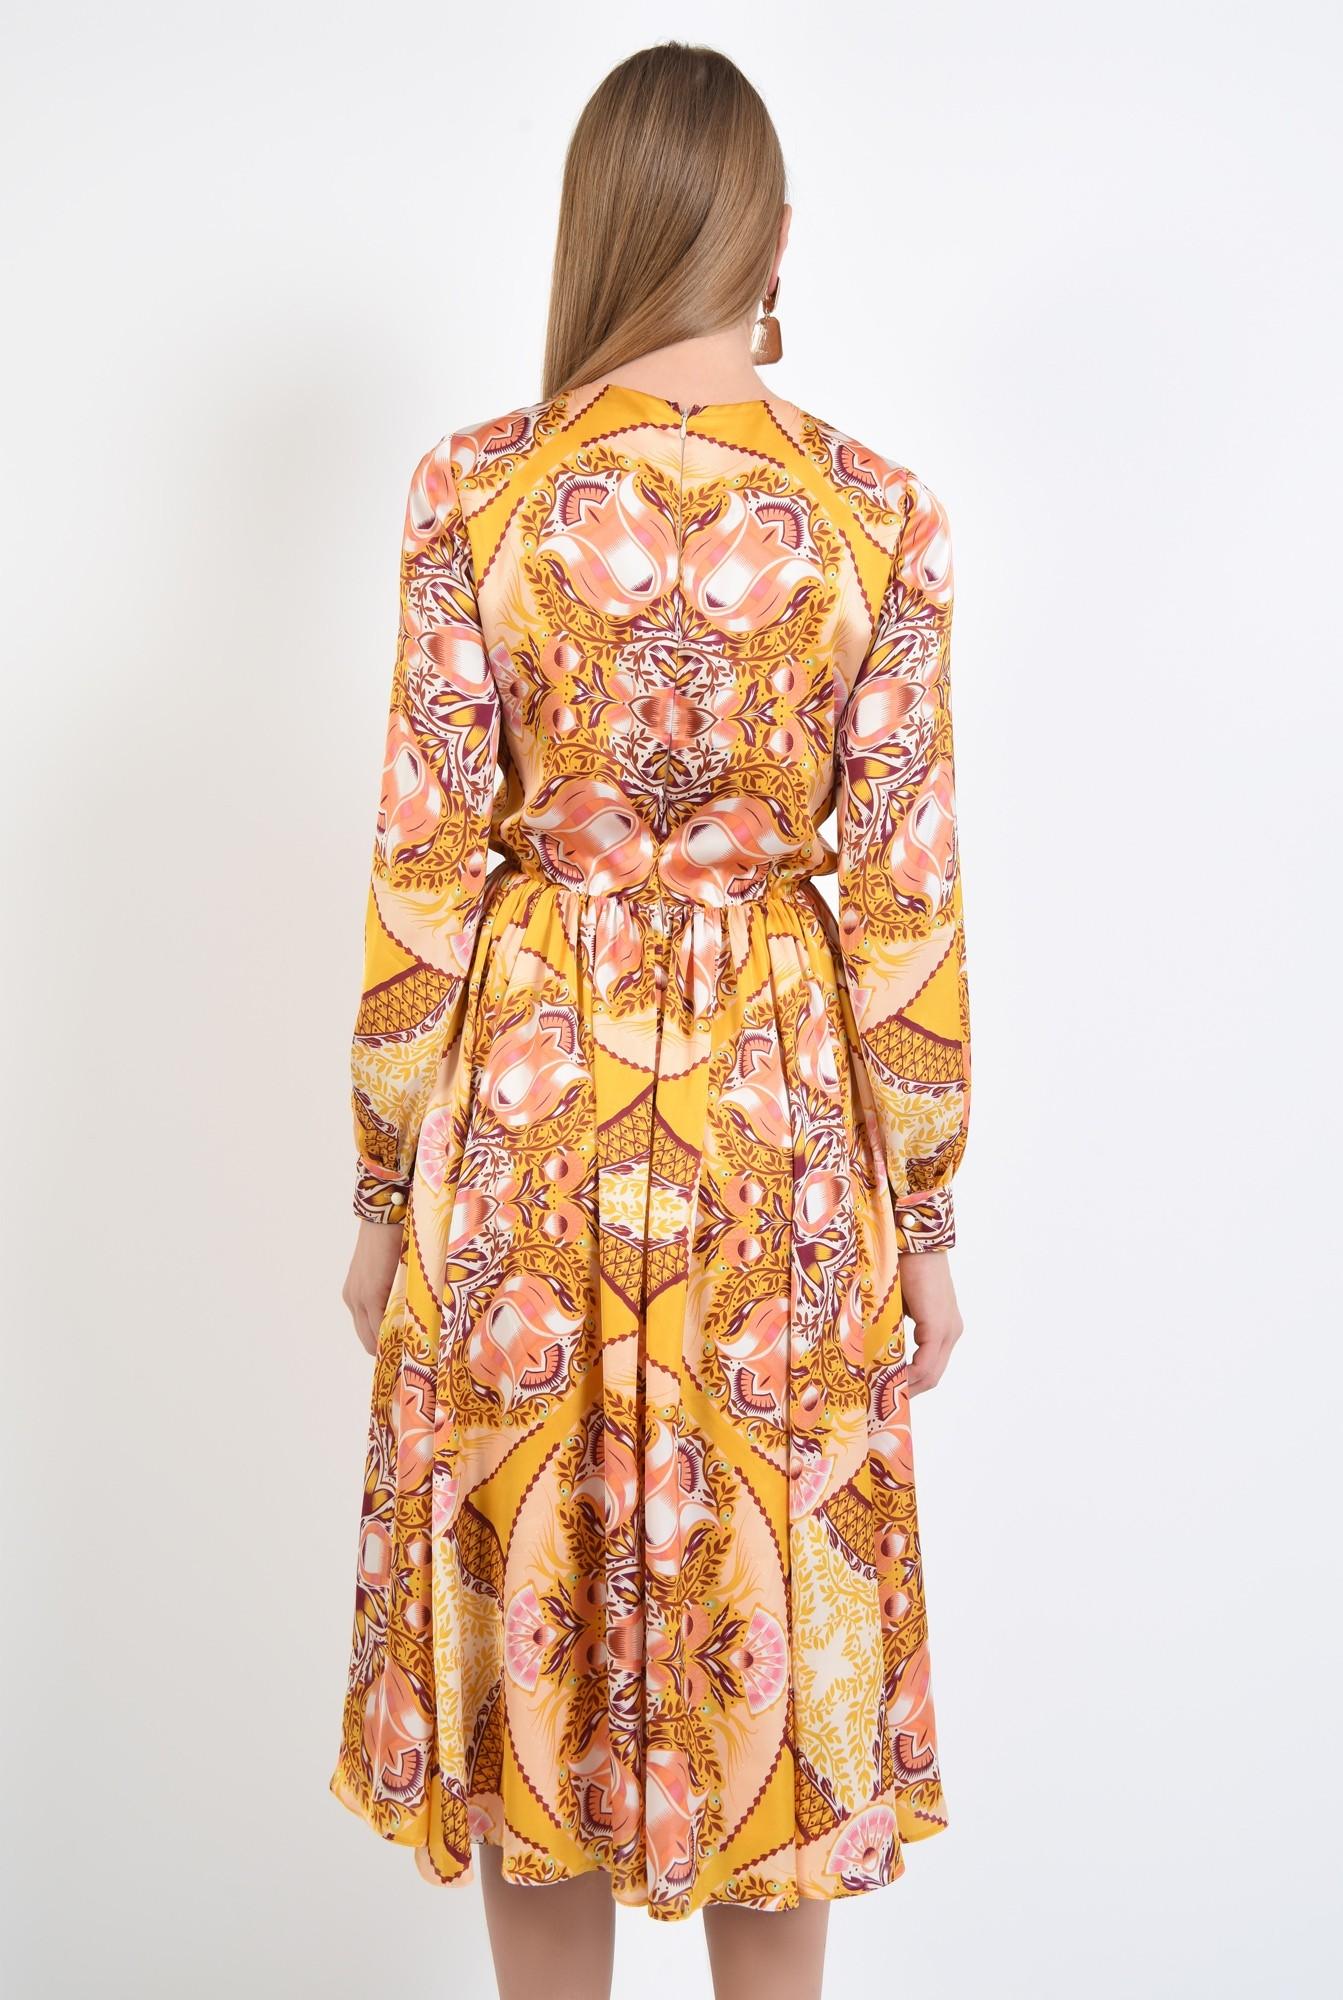 1 - 360 - rochie imprimata, midi, croi pe bie, galben mustar, imprimeu abstract